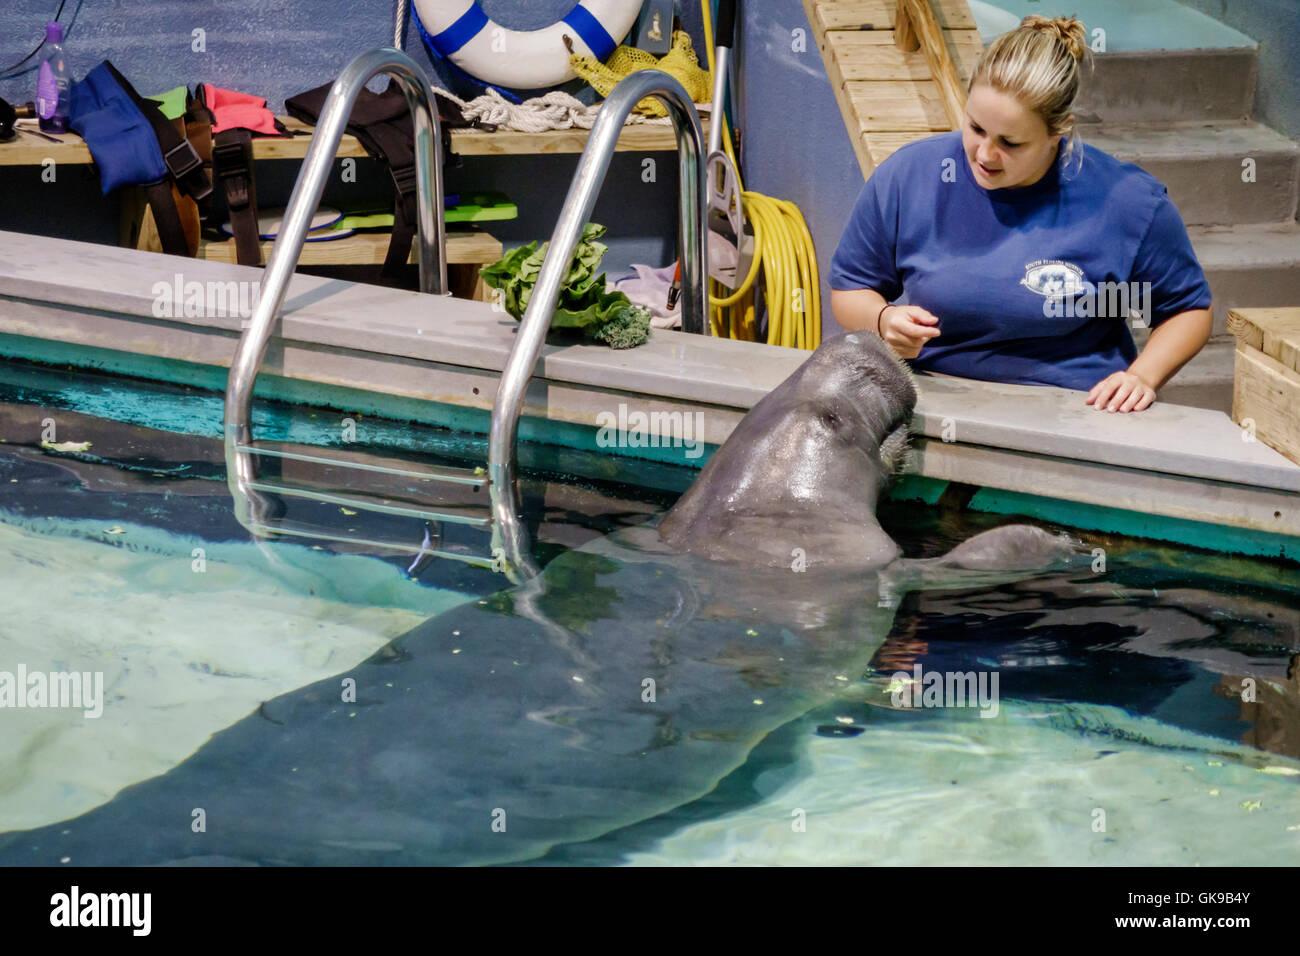 Florida Gulf Coast Bradenton South Florida Museum Parker Manatee Aquarium natural history marine environment exhibition - Stock Image